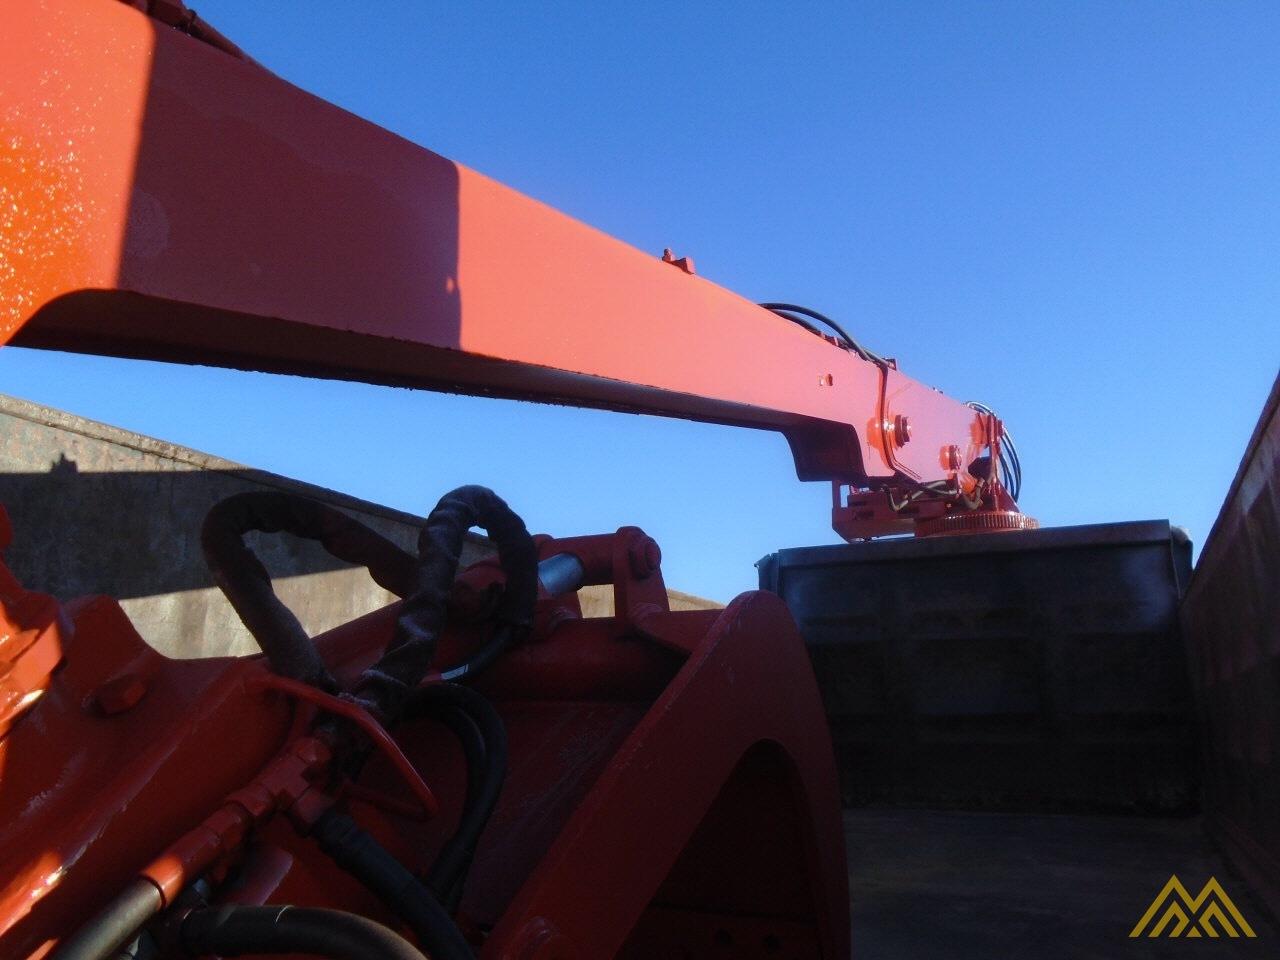 Hood Equipment 8000 Series 5 95-Ton Grapple Loader Crane